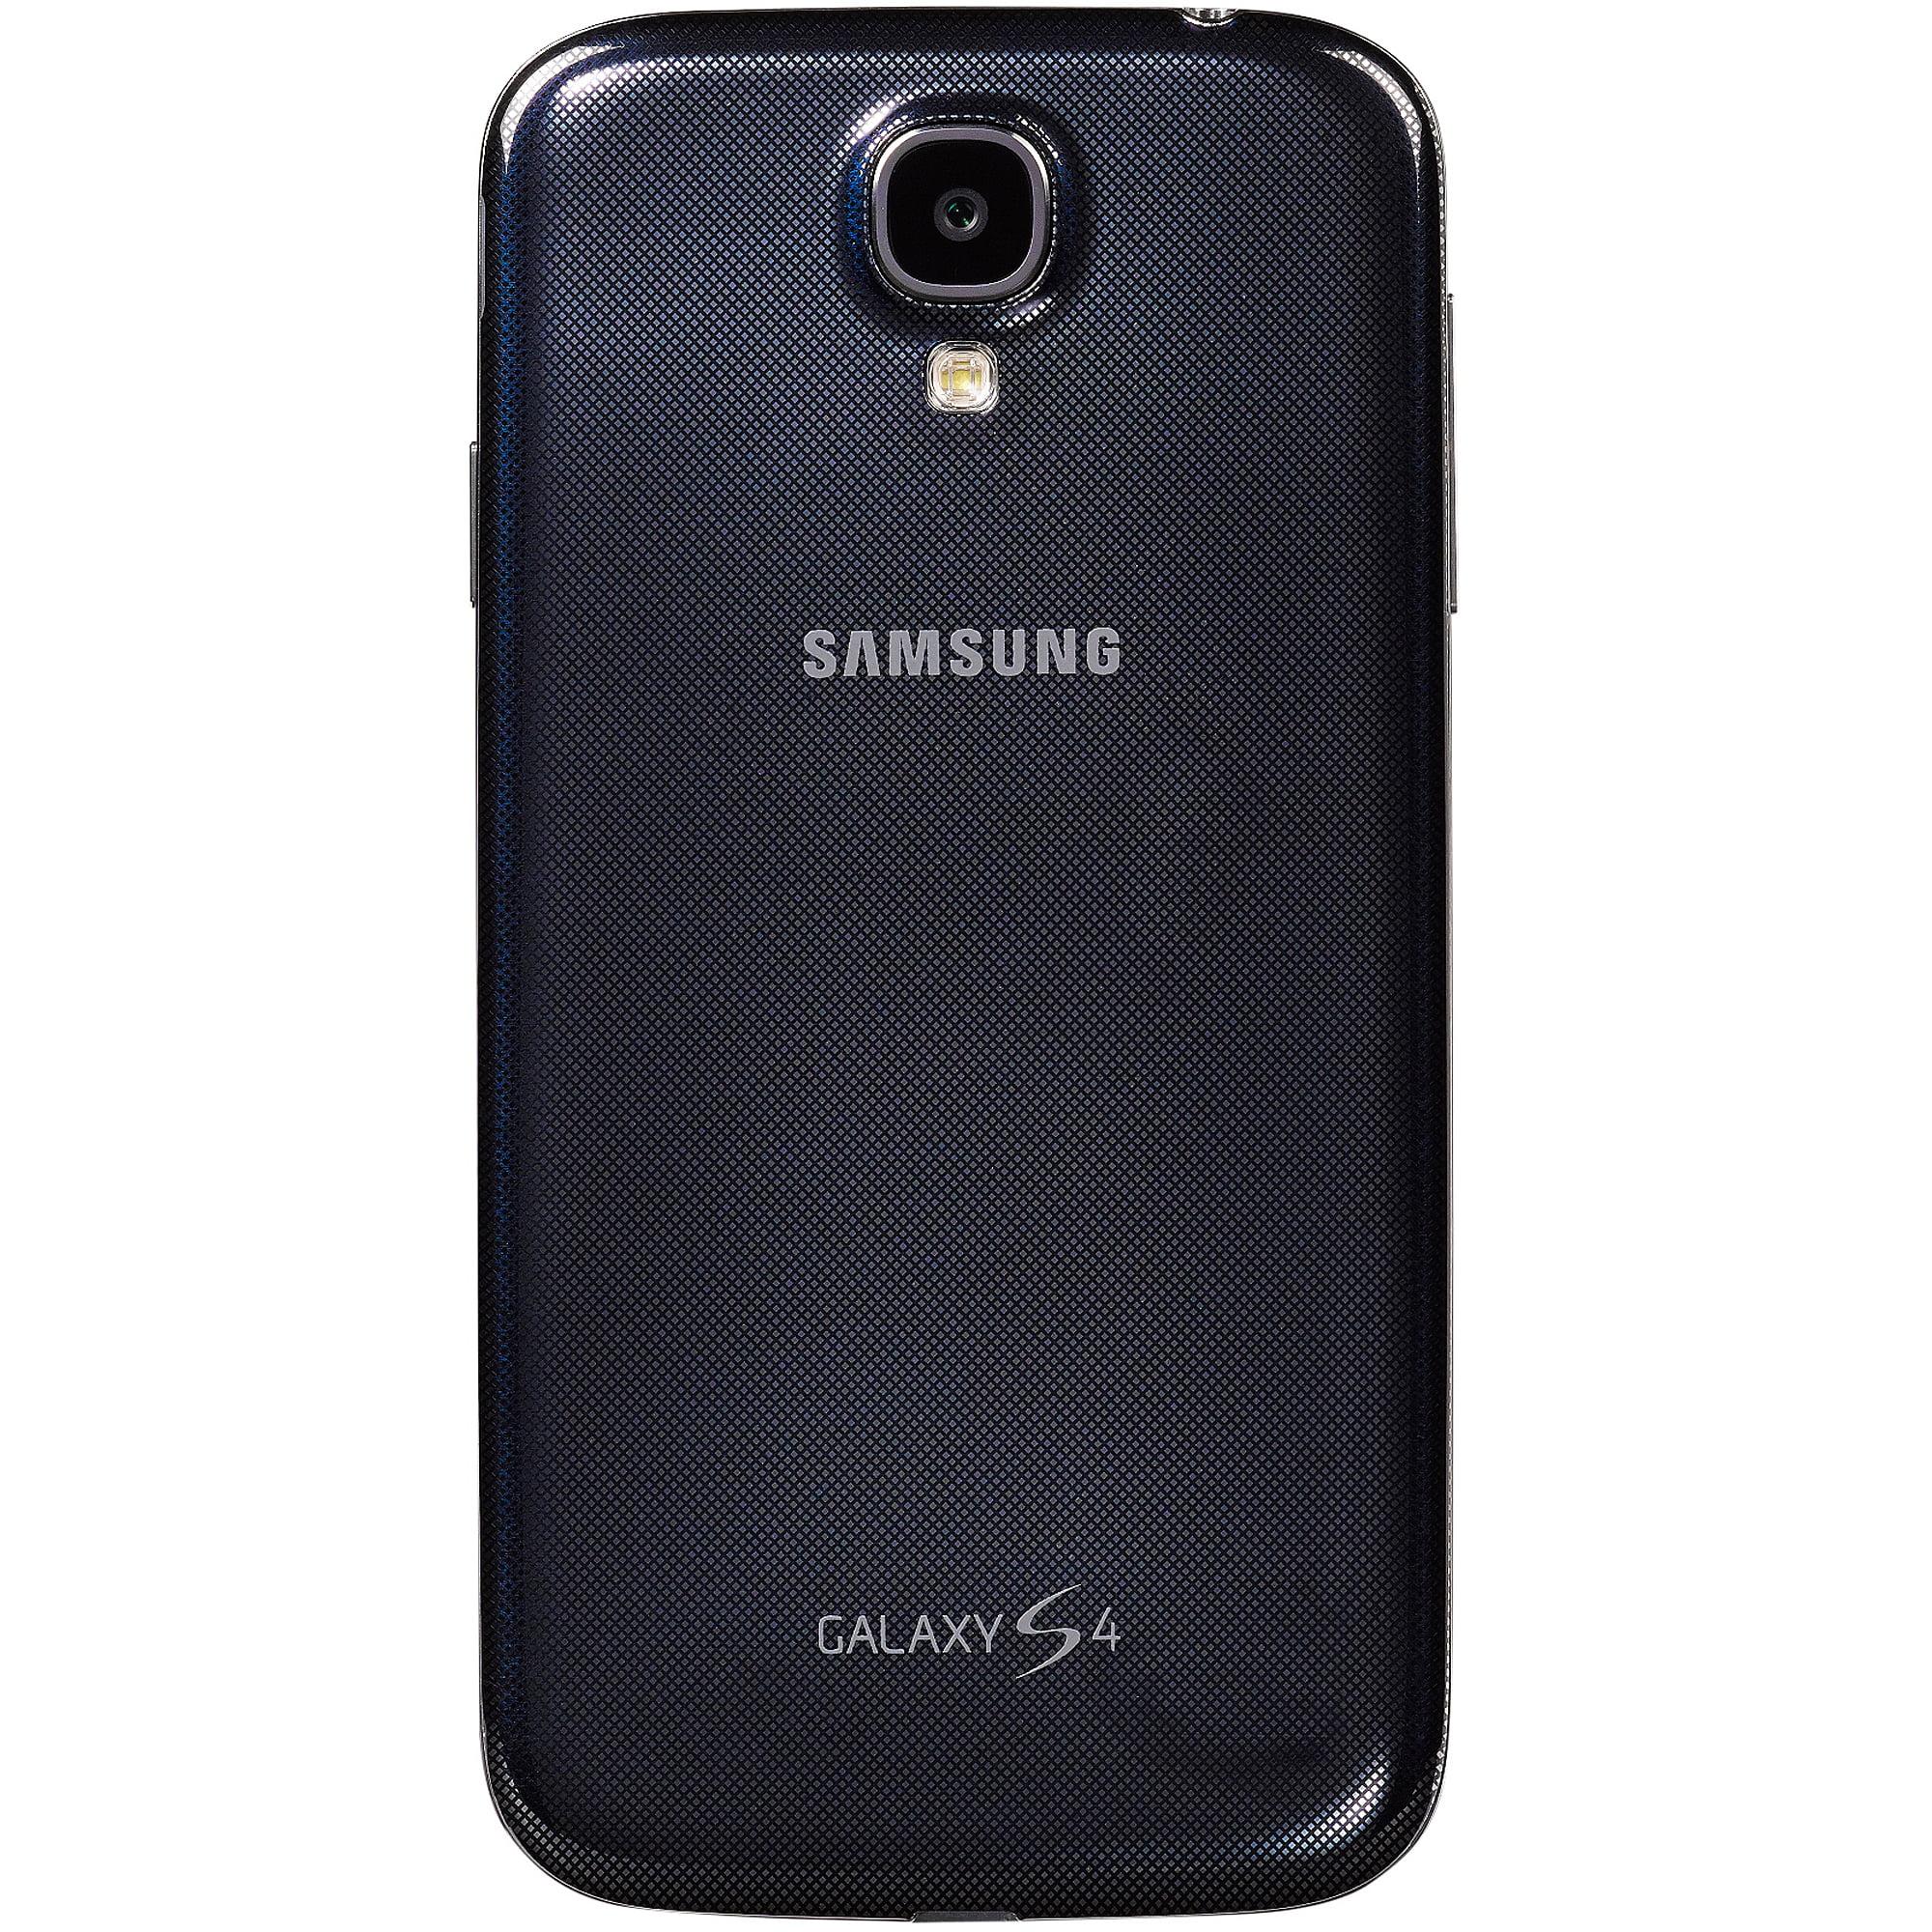 Straight talk samsung galaxy s4 4g lte prepaid smartphone walmart com